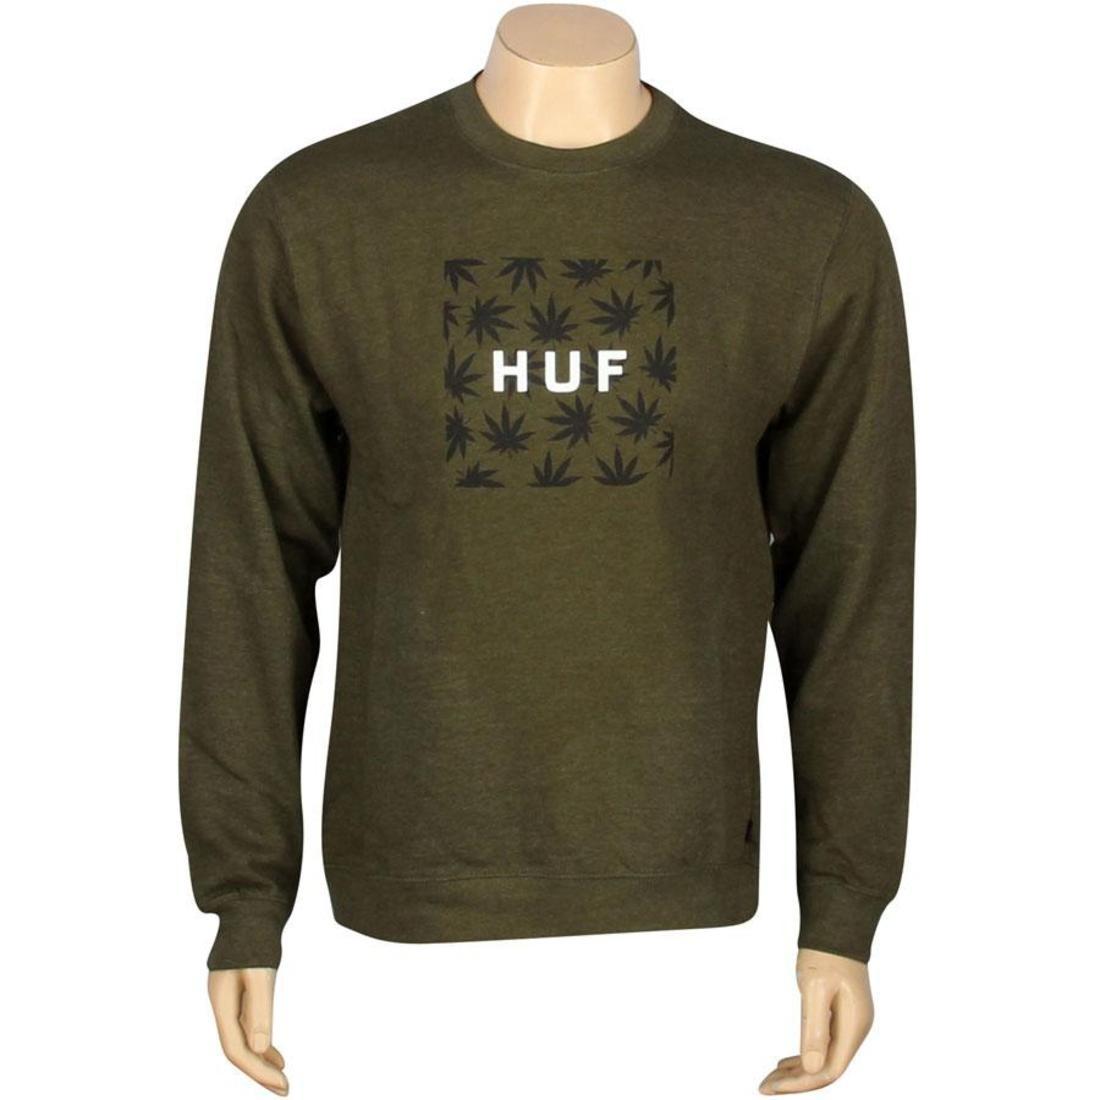 HUF プラントライフ ボックス ロゴ メンズファッション トップス Tシャツ カットソー メンズ 【 Plantlife Box Logo Crewneck (military Heather) 】 Military Heather